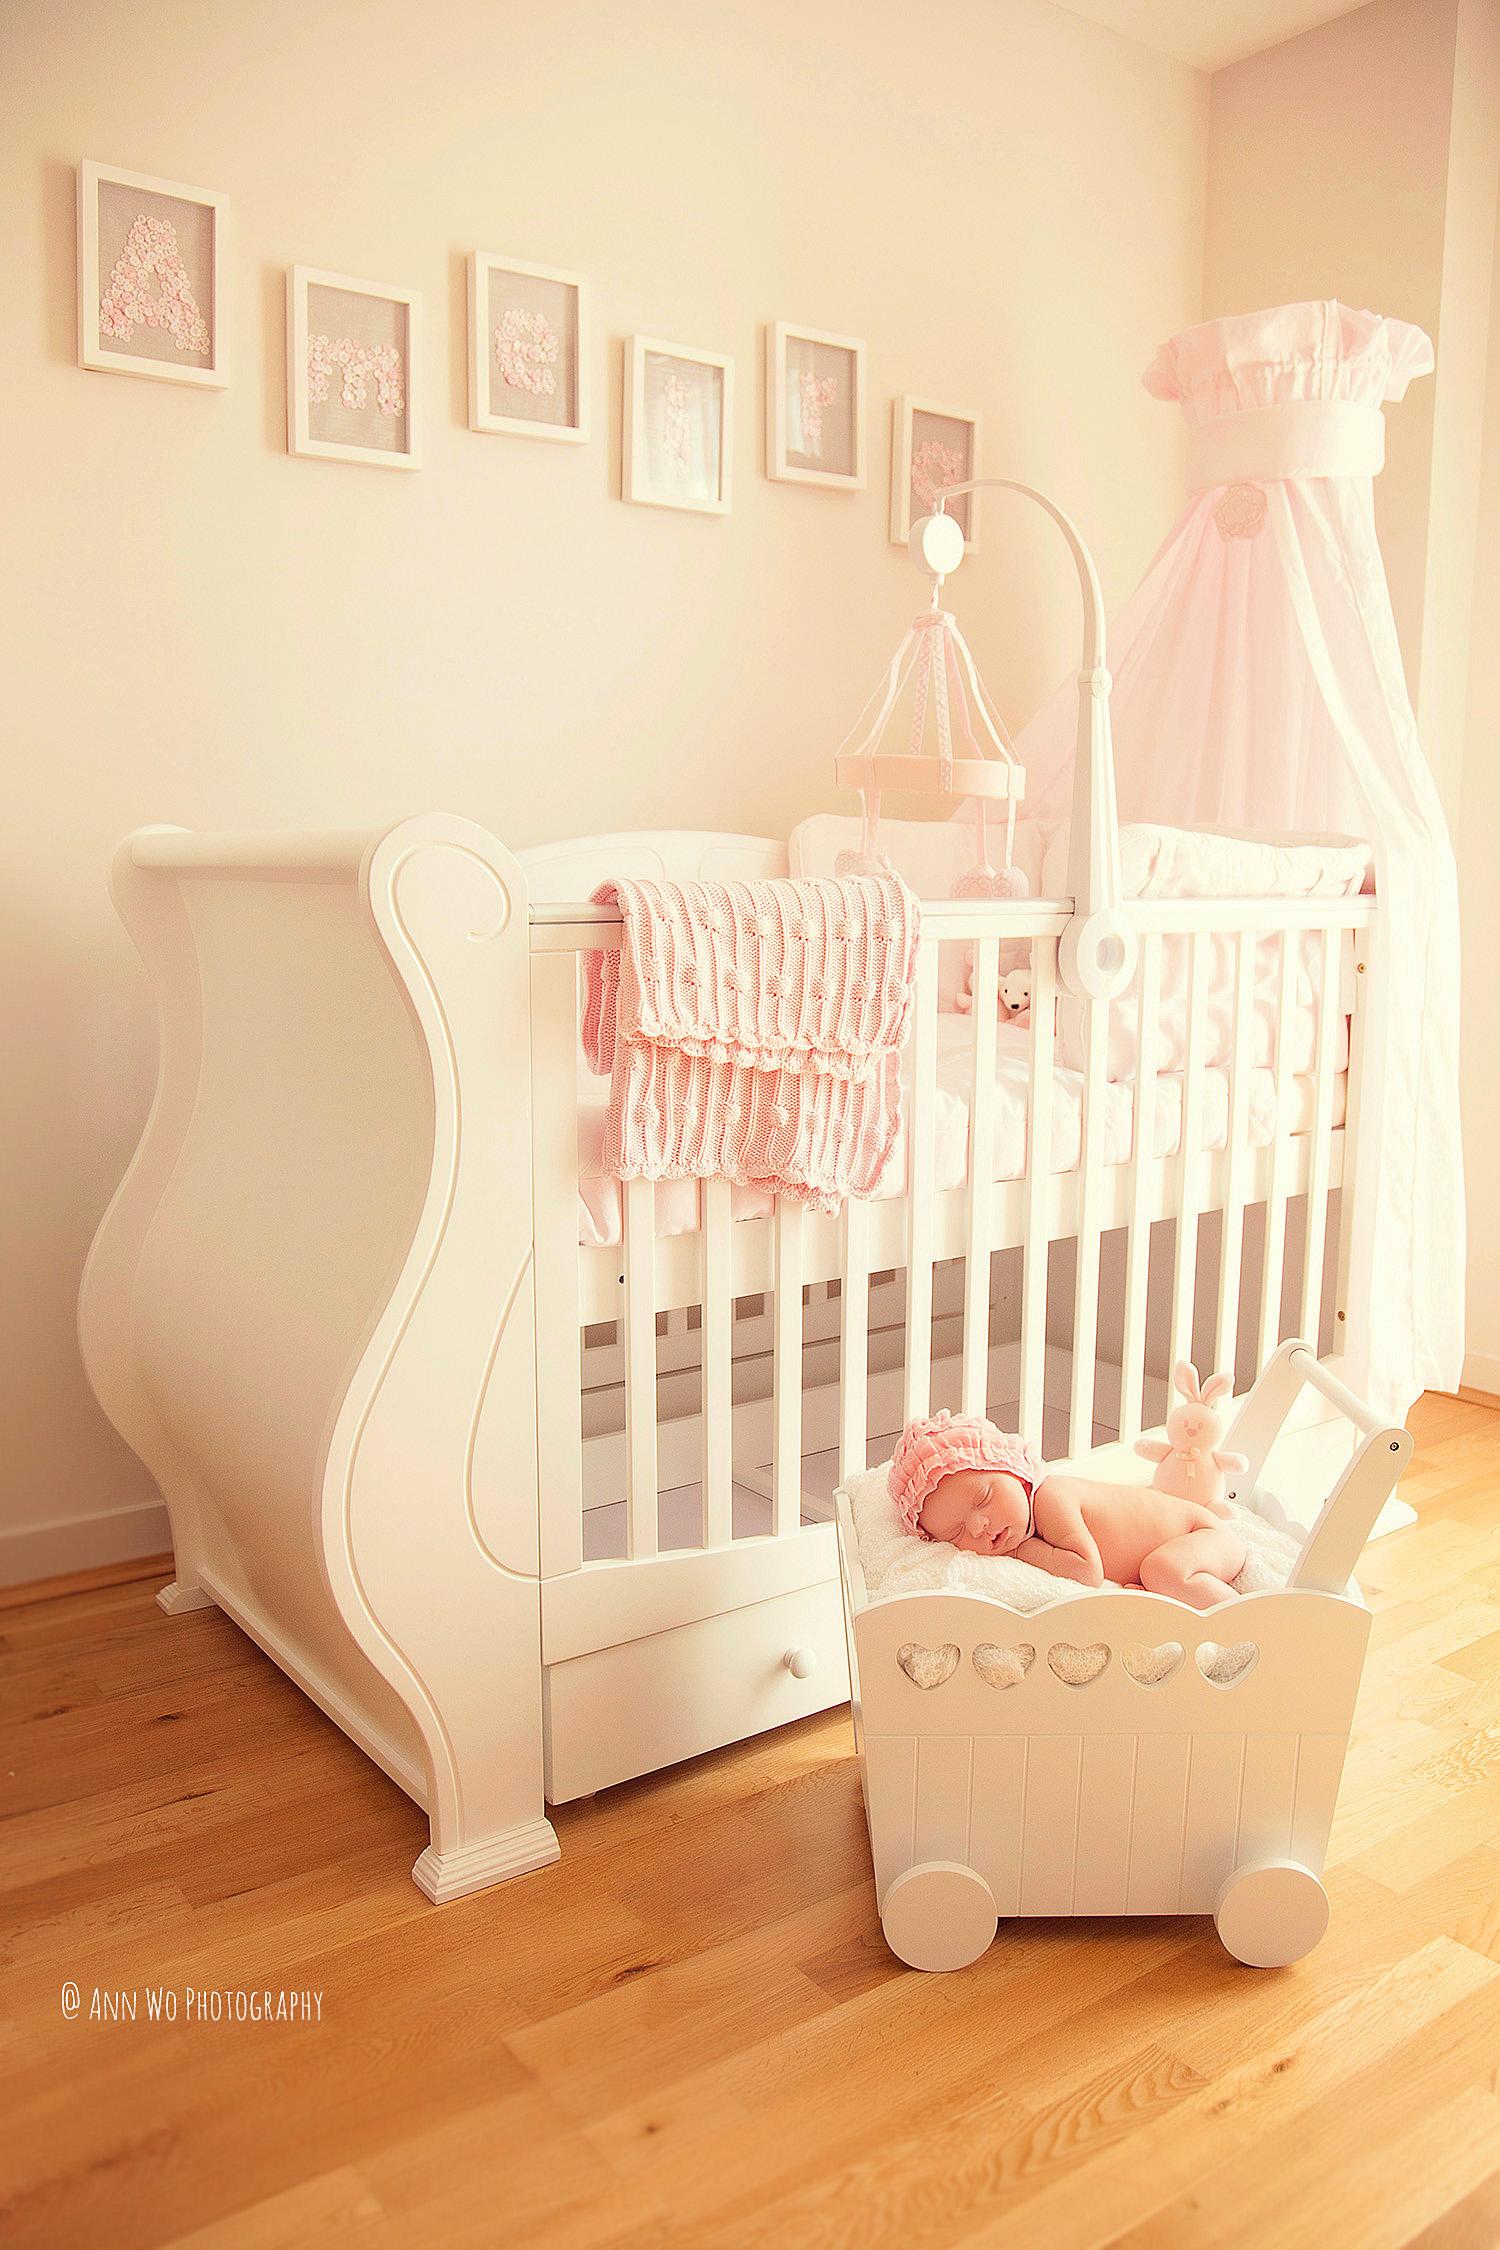 newborn-photographer-west-london-home-session-ann-wo13.jpg